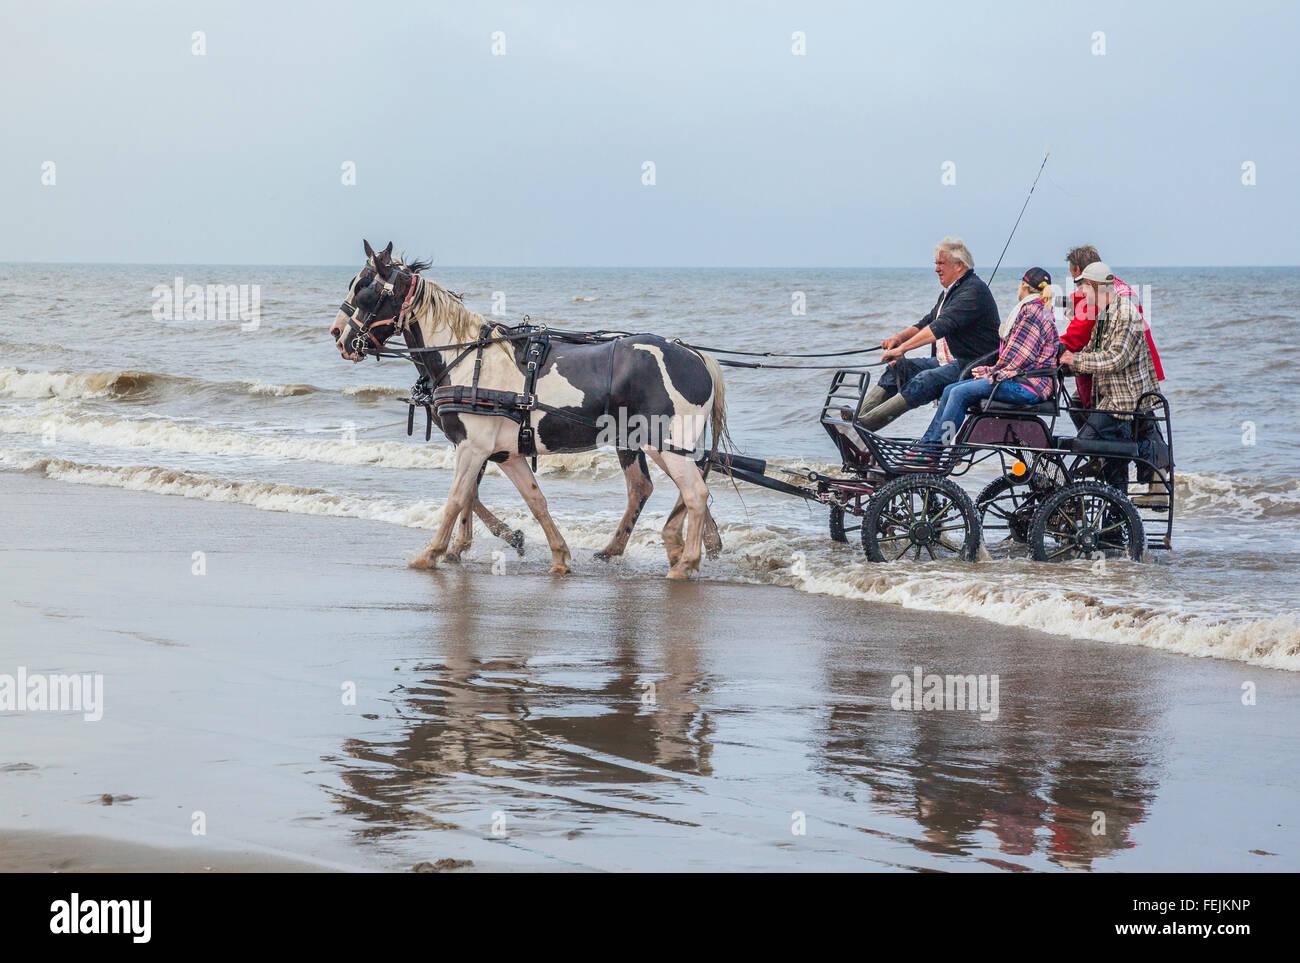 Netherlands, South Holland, Noordwijk, fun horse-drwan carriage rides in the surf of Langevelderslag Beach - Stock Image